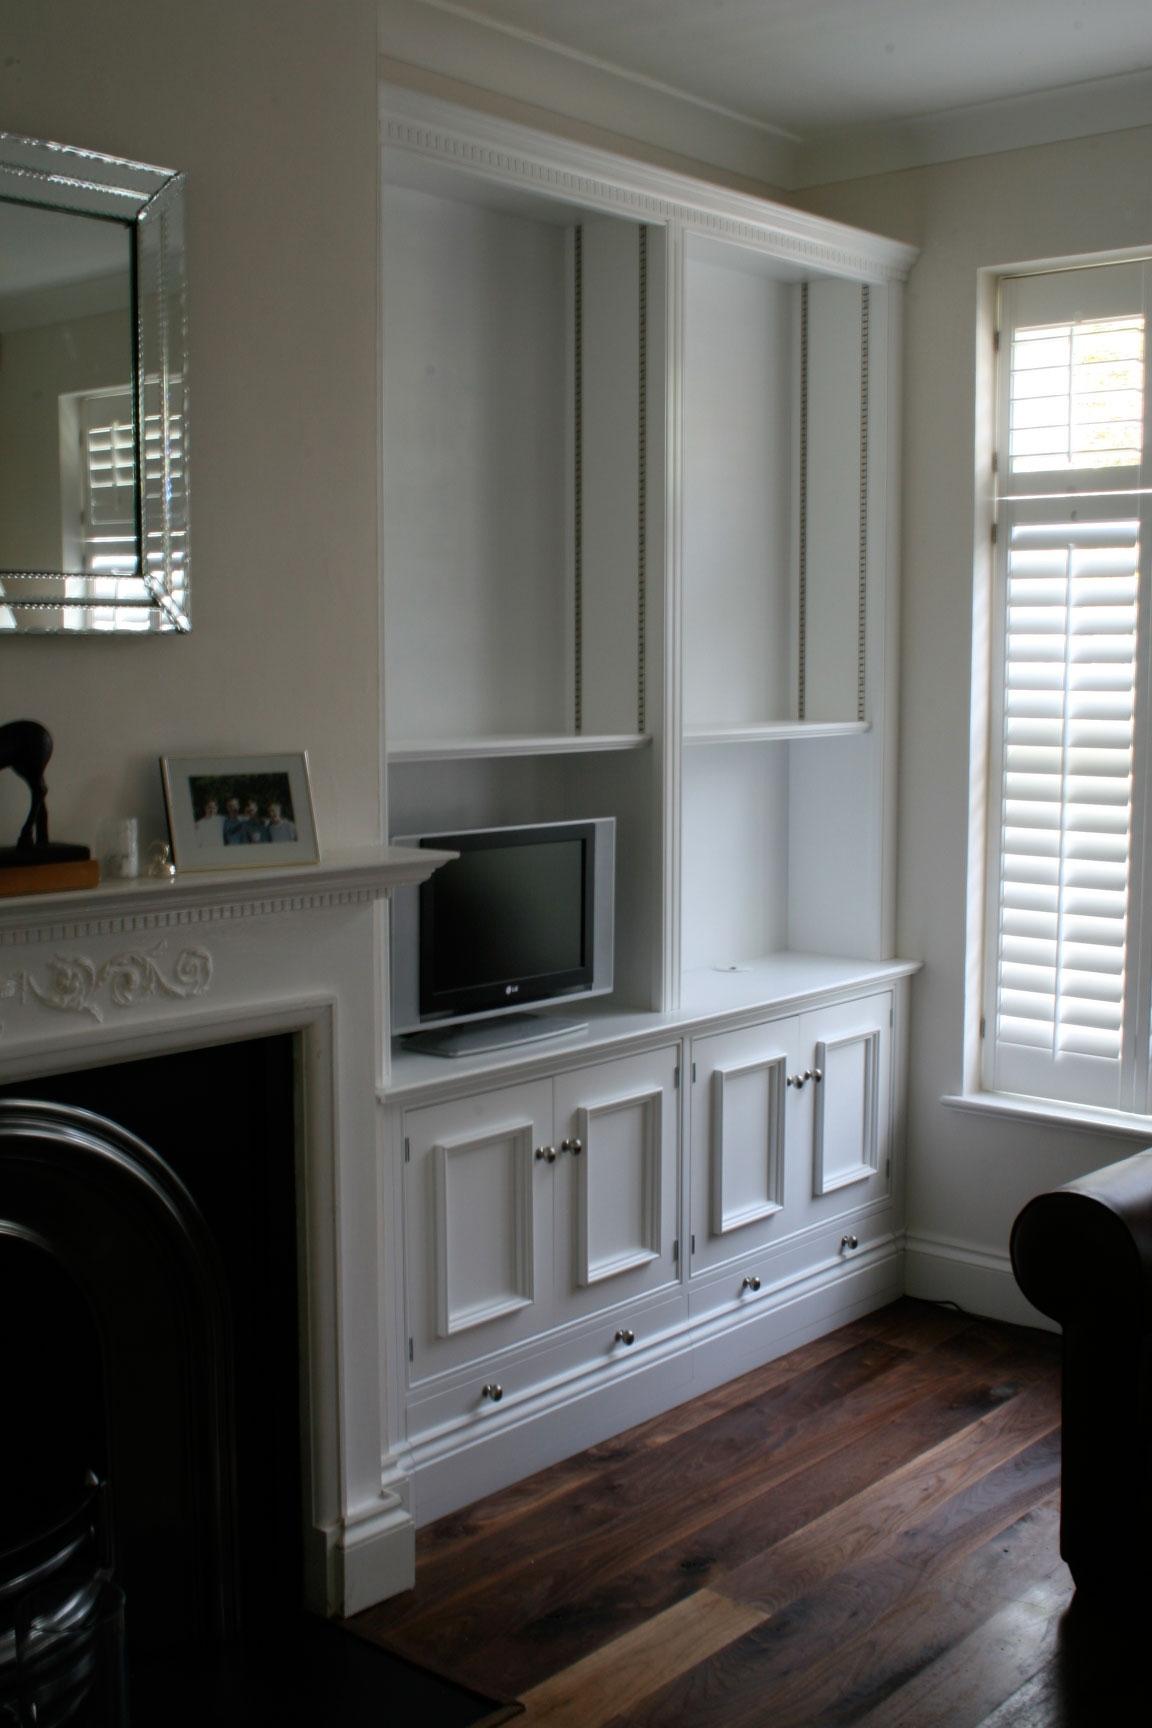 Bespoke Cabinetry Bookcases Desks Cabinet Makers Intended For Bespoke Tv Unit (#3 of 15)